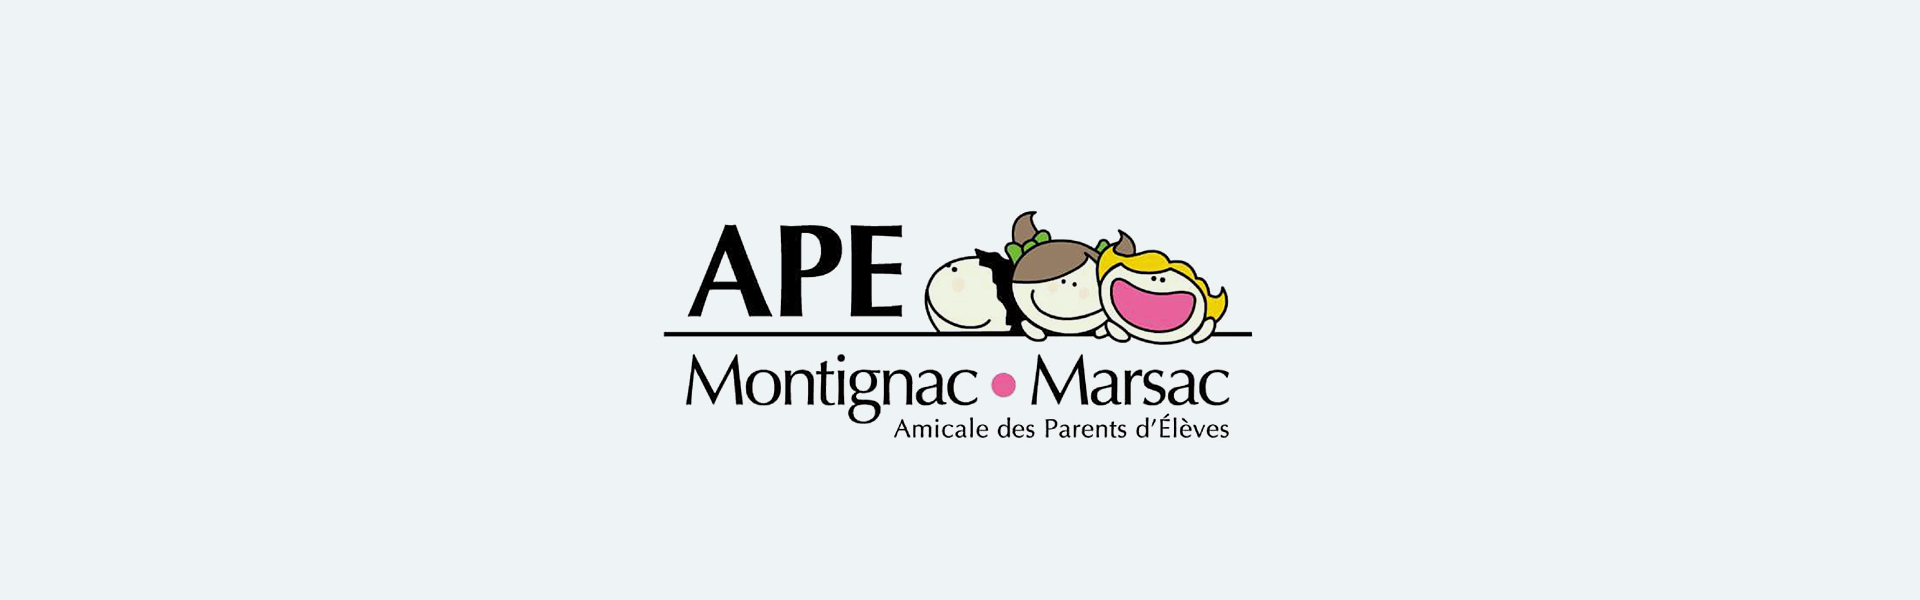 Montignac-Charente-bandeau-APE-Montignac-Marsac